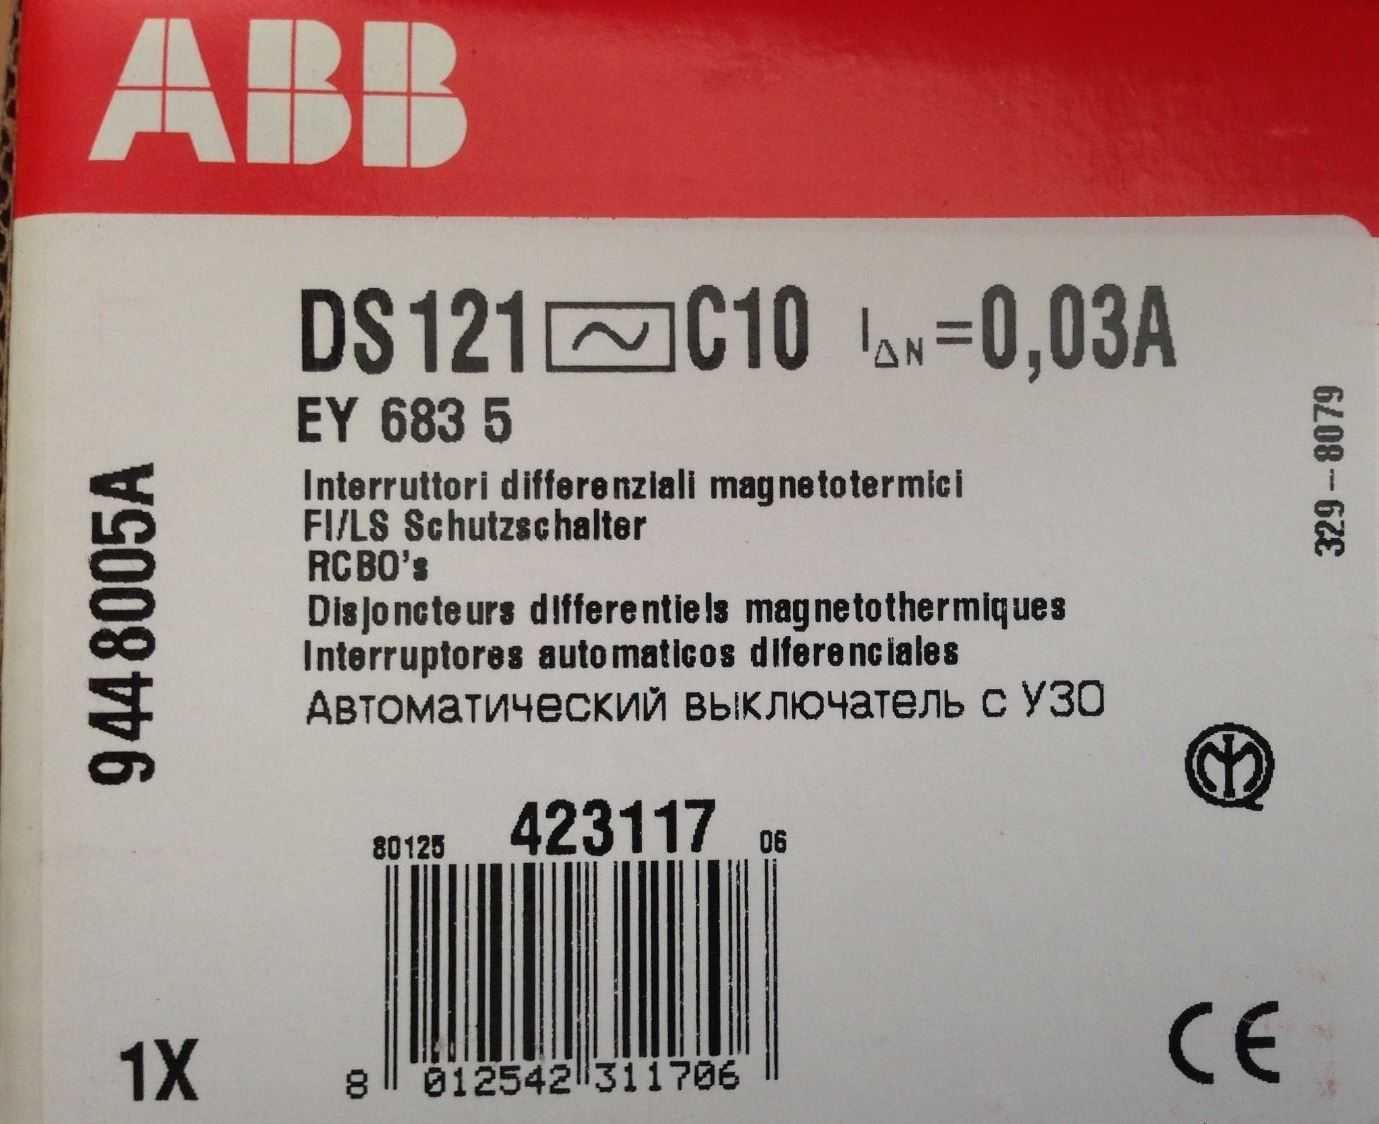 INTERRUTTORE DIFFERENZIALE MAGNETOTERMICO 20A 2P 30MA - ABB SACE EY 686 8